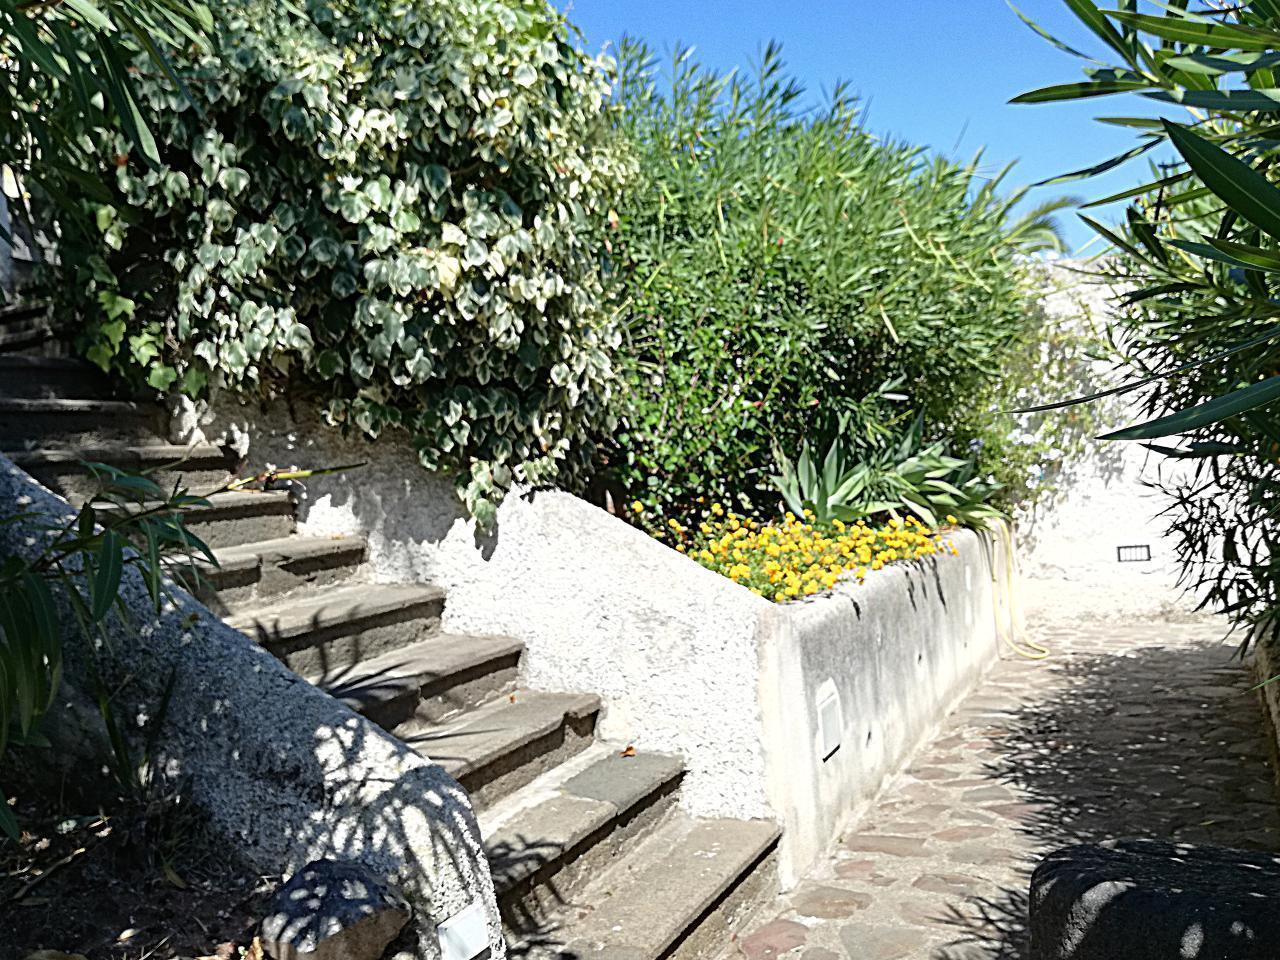 Maison de vacances Ferienhaushälfte Solandra auf sizilianischer Insel mit atemberaubenden Meeres-Rundblick (2038046), Lipari, Lipari, Sicile, Italie, image 34